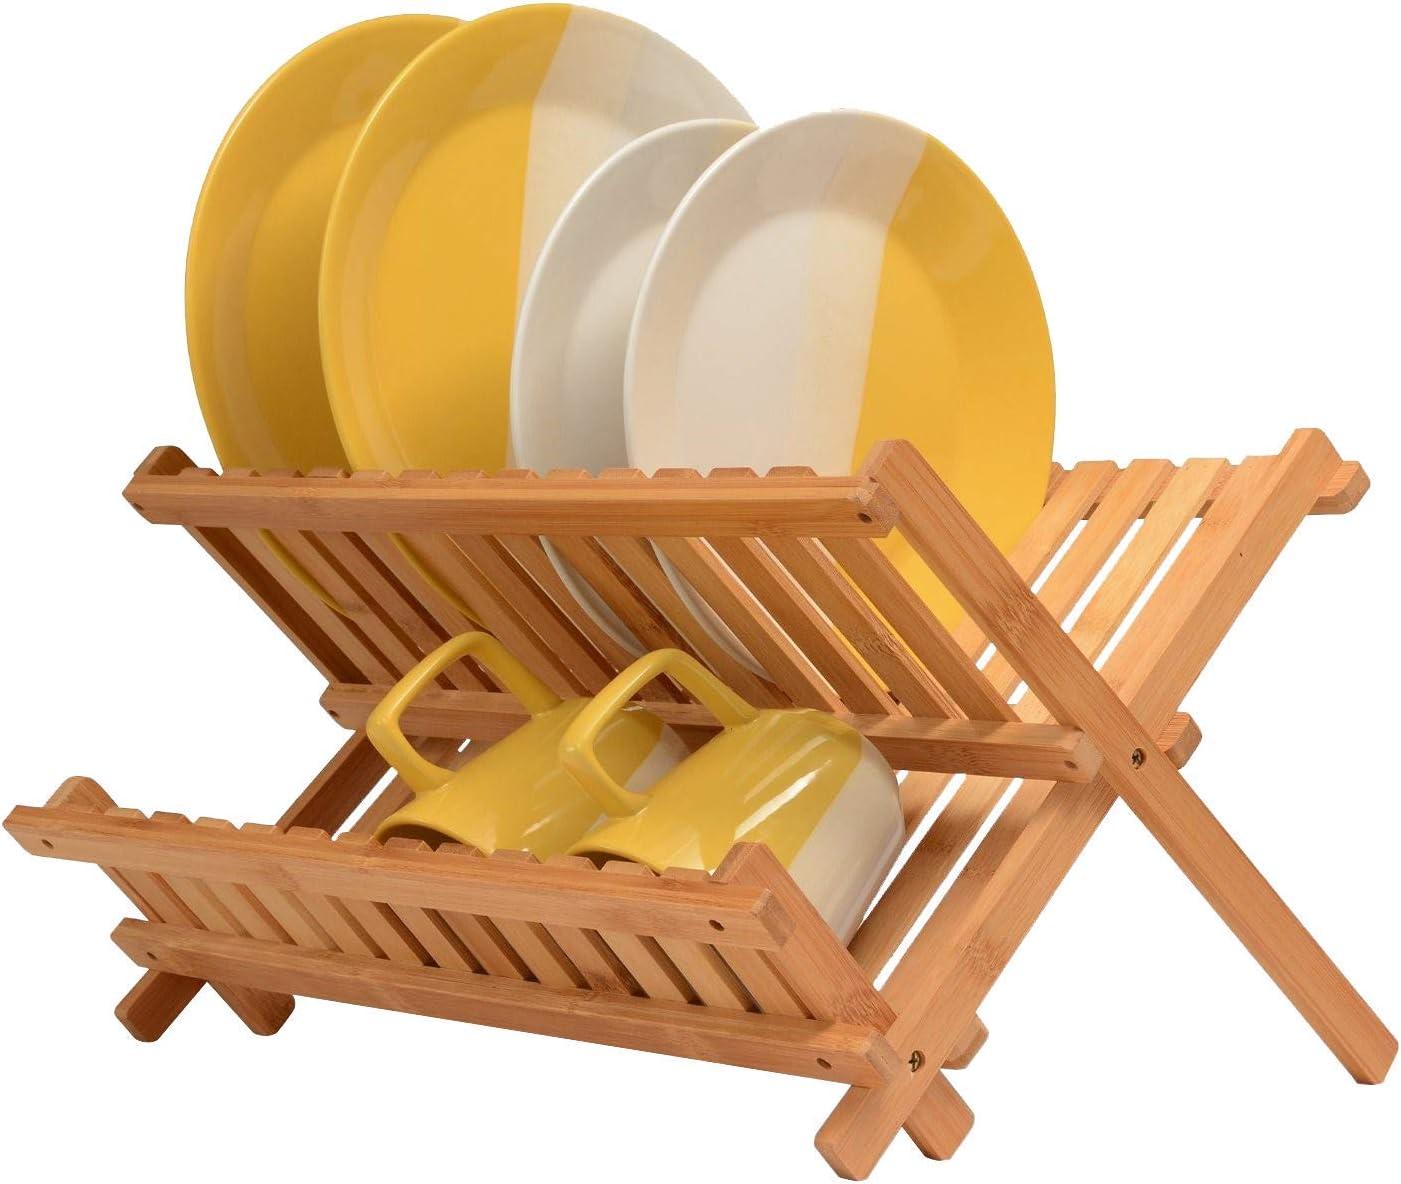 buwei Plate Organizer 8 Slots Chrome Plated Dish Racks Countertop Drying Stand